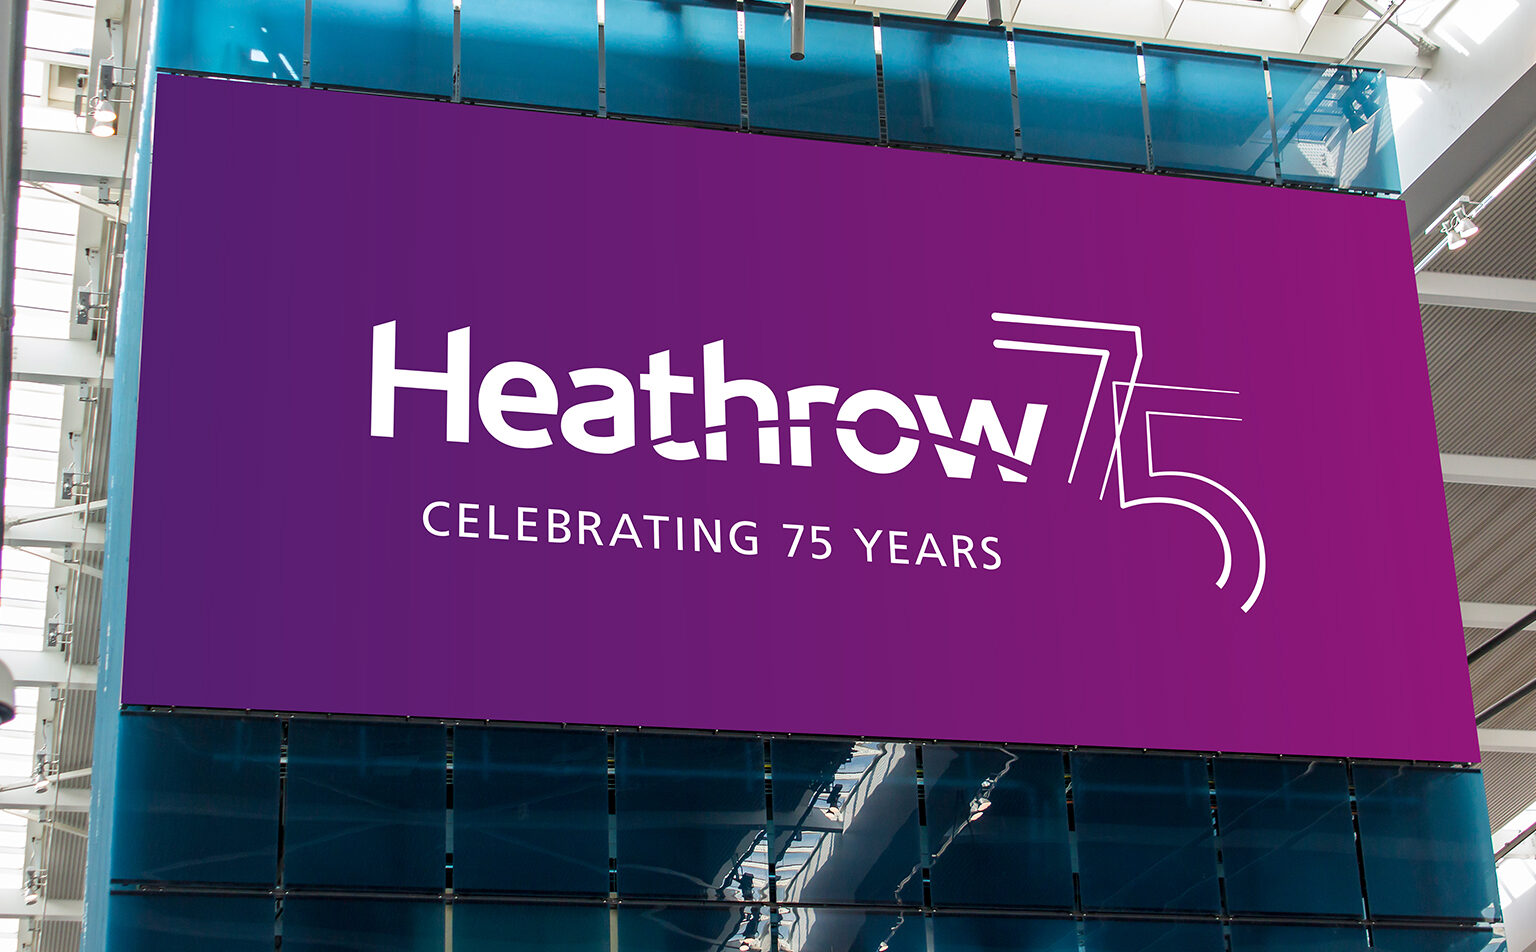 Heathrow-Feature-Image copy